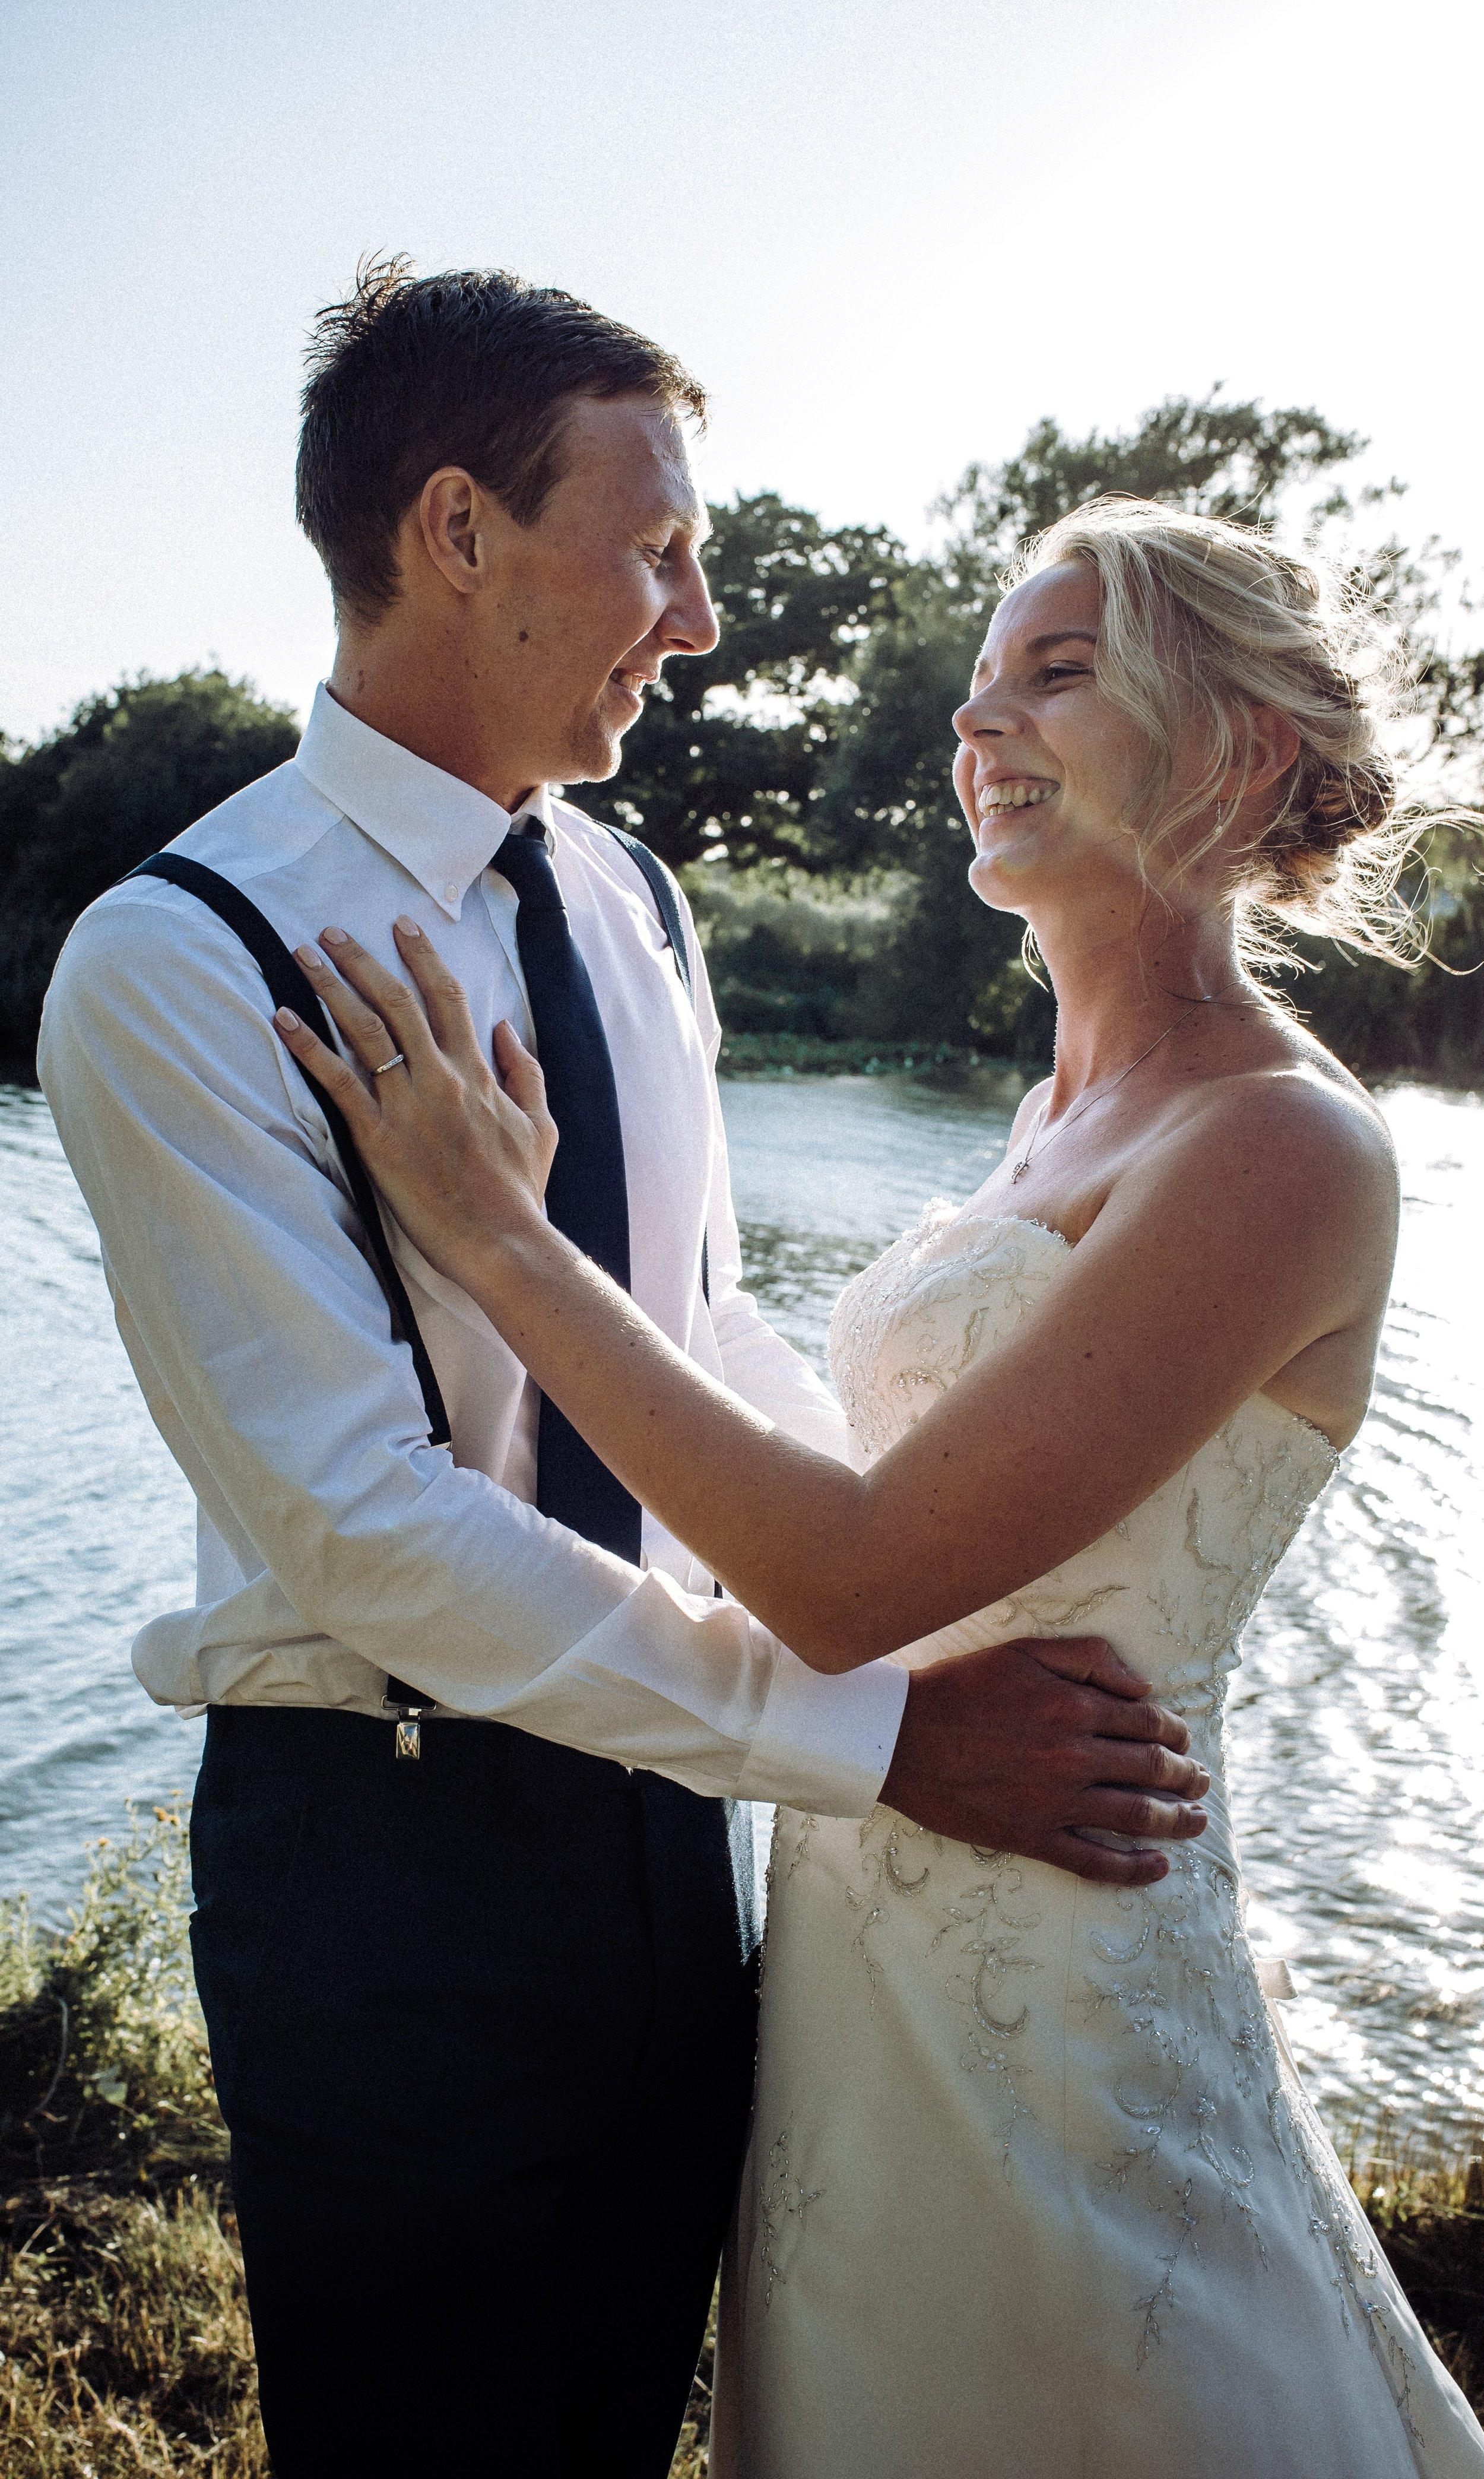 Vintage Wedding - East Sussex Wedding Photographer_0031.jpg